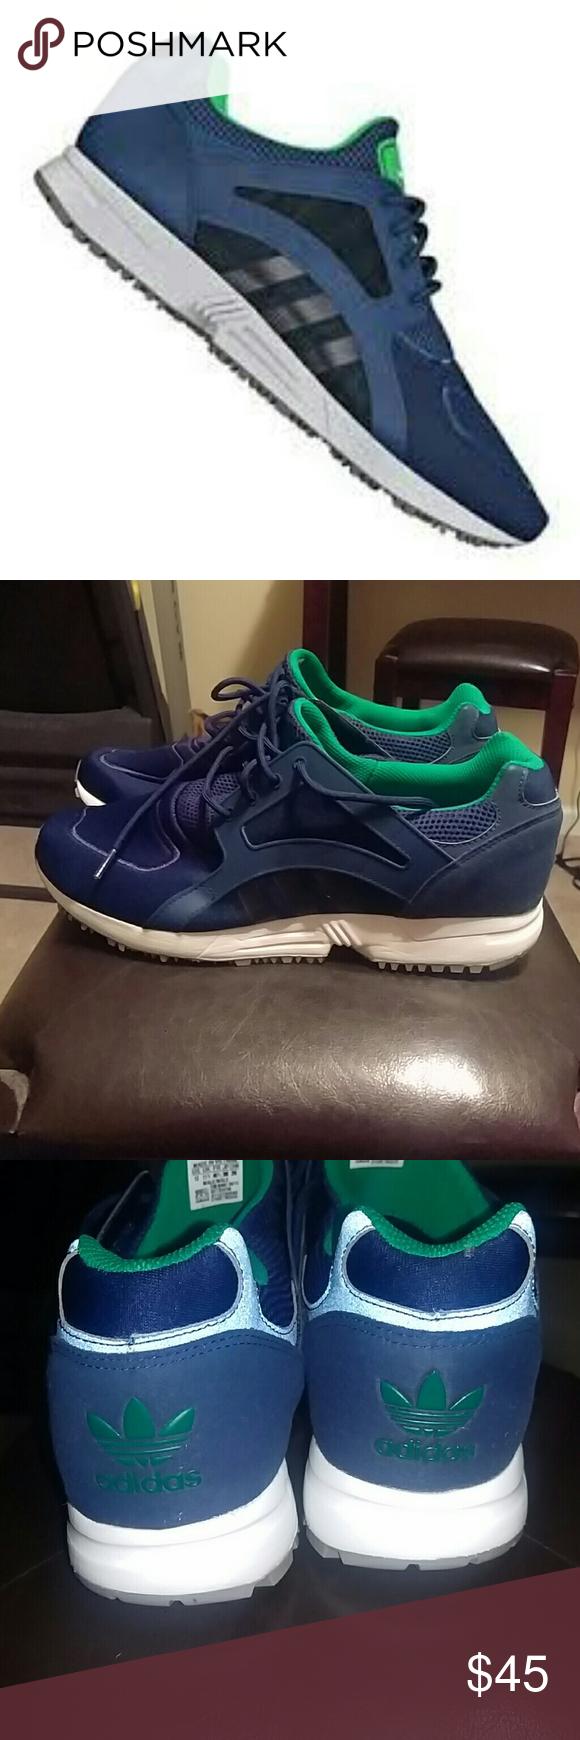 New Adidas Originals racer Lite Men Sneakers Training  Running B24798 Blue White